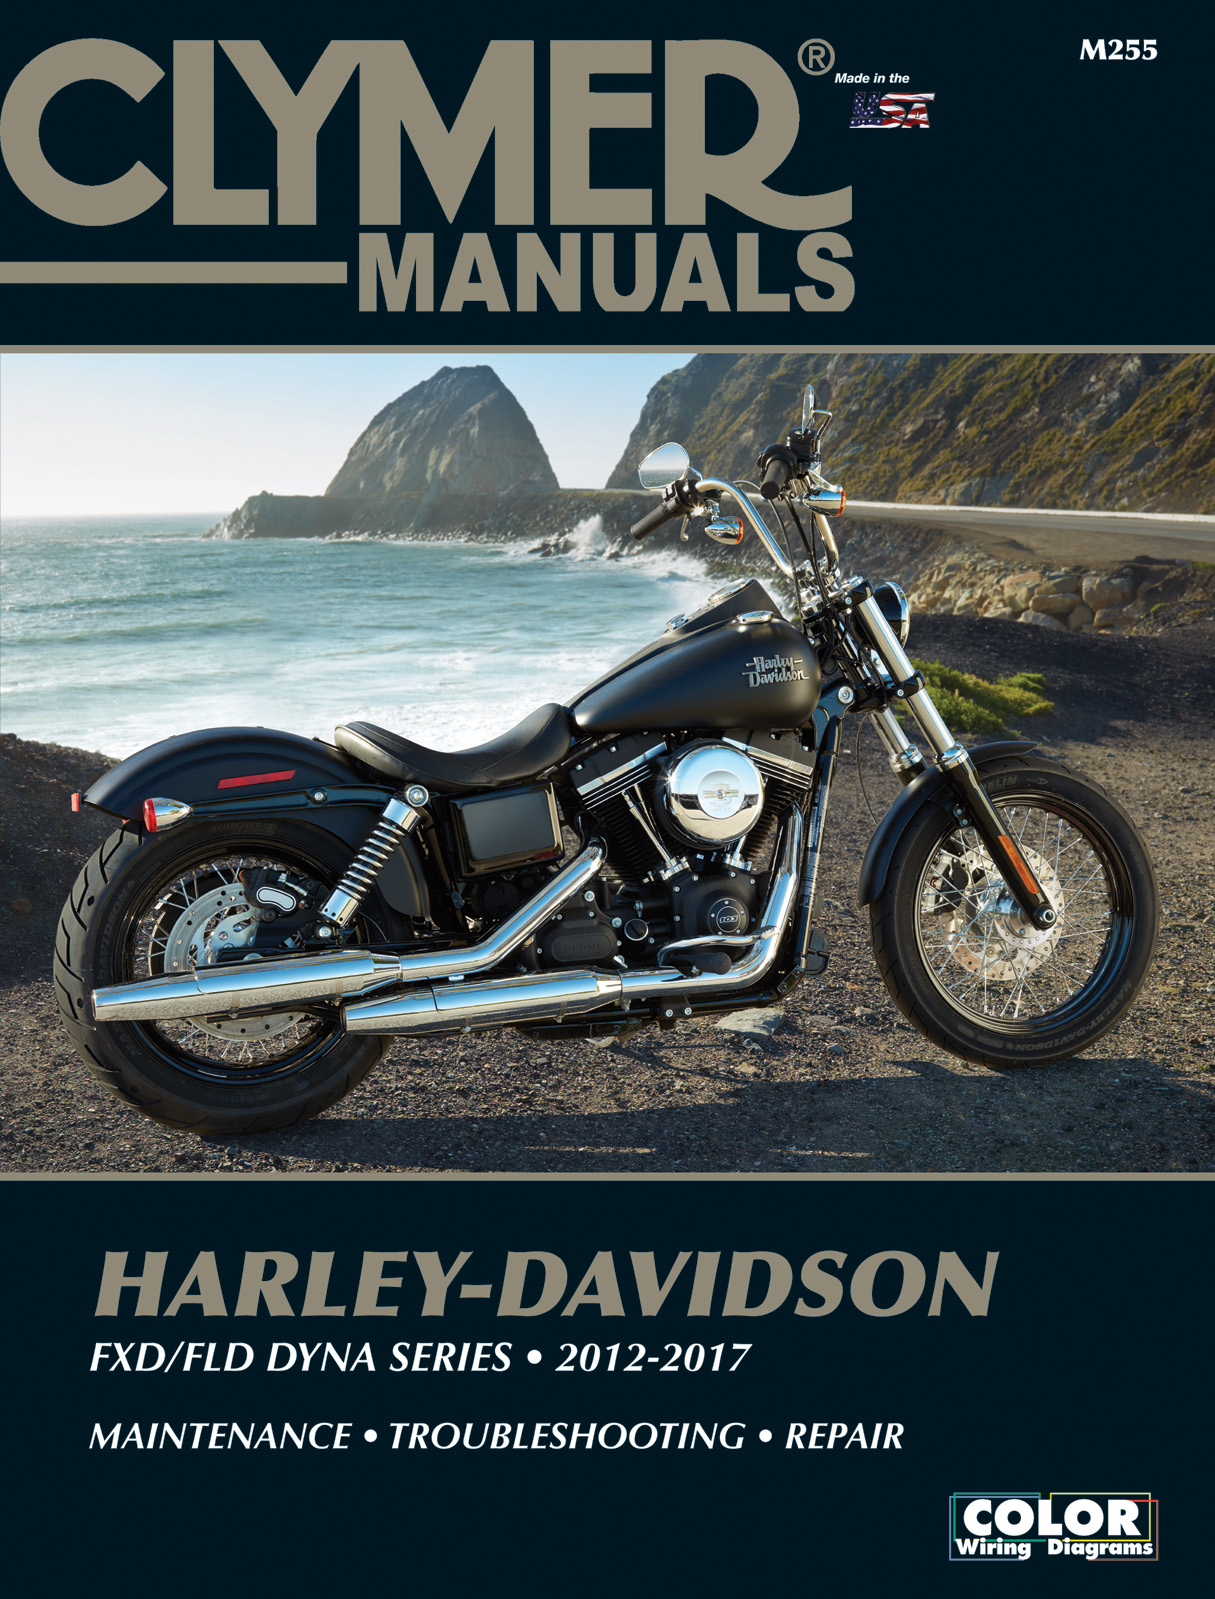 harley-davidson fxdb street bob (2012 - 2017) motorcycle repair manuals |  haynes manuals  haynes manuals